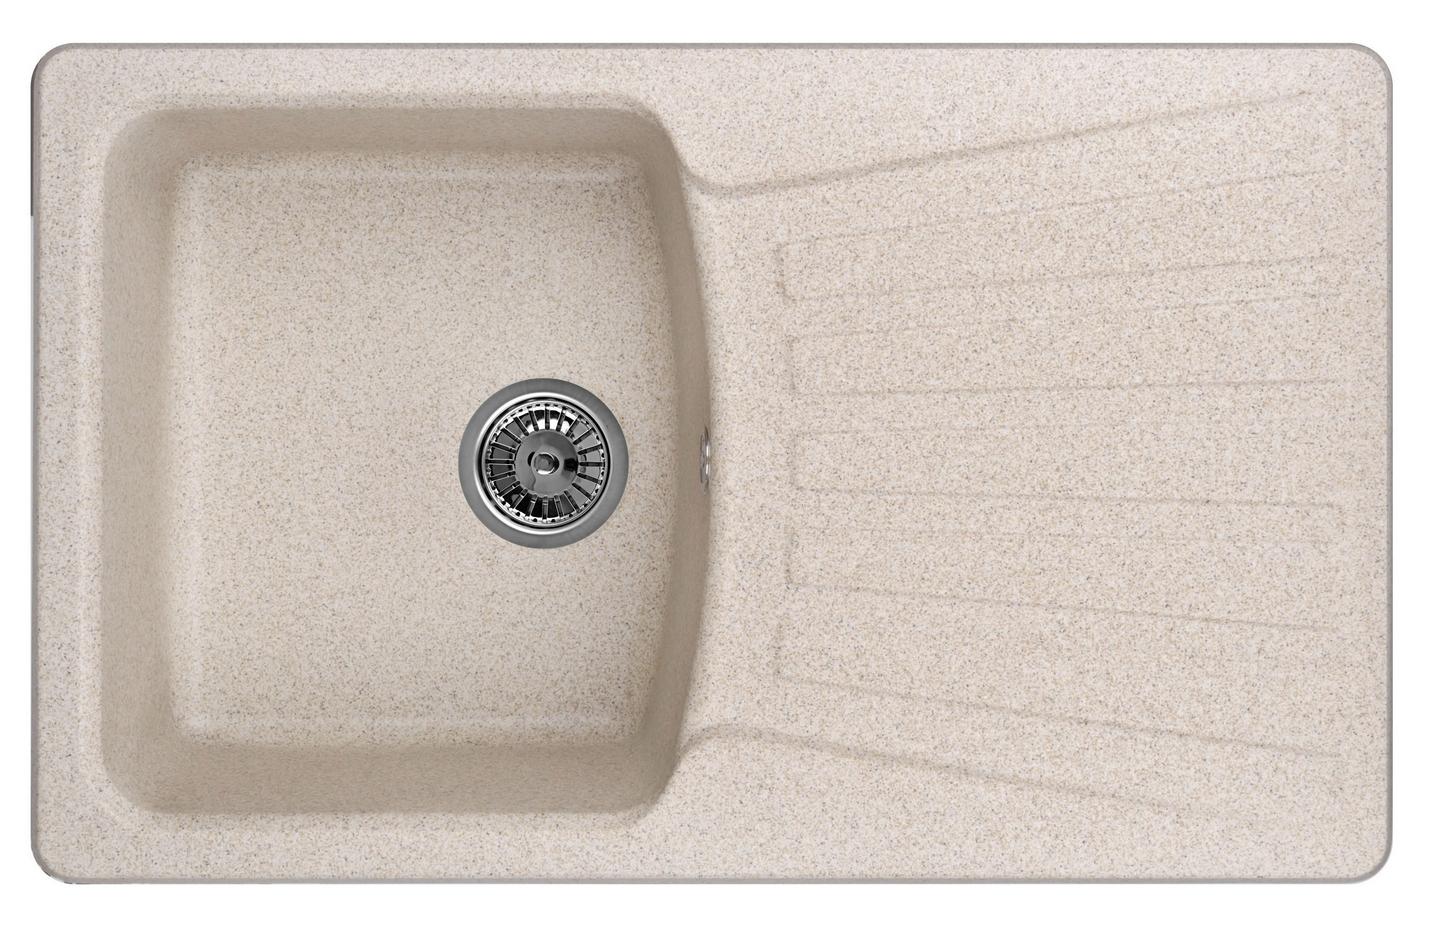 Мойка кухонная Granula Gr-8001 кухонная мойка granula 4201 классик